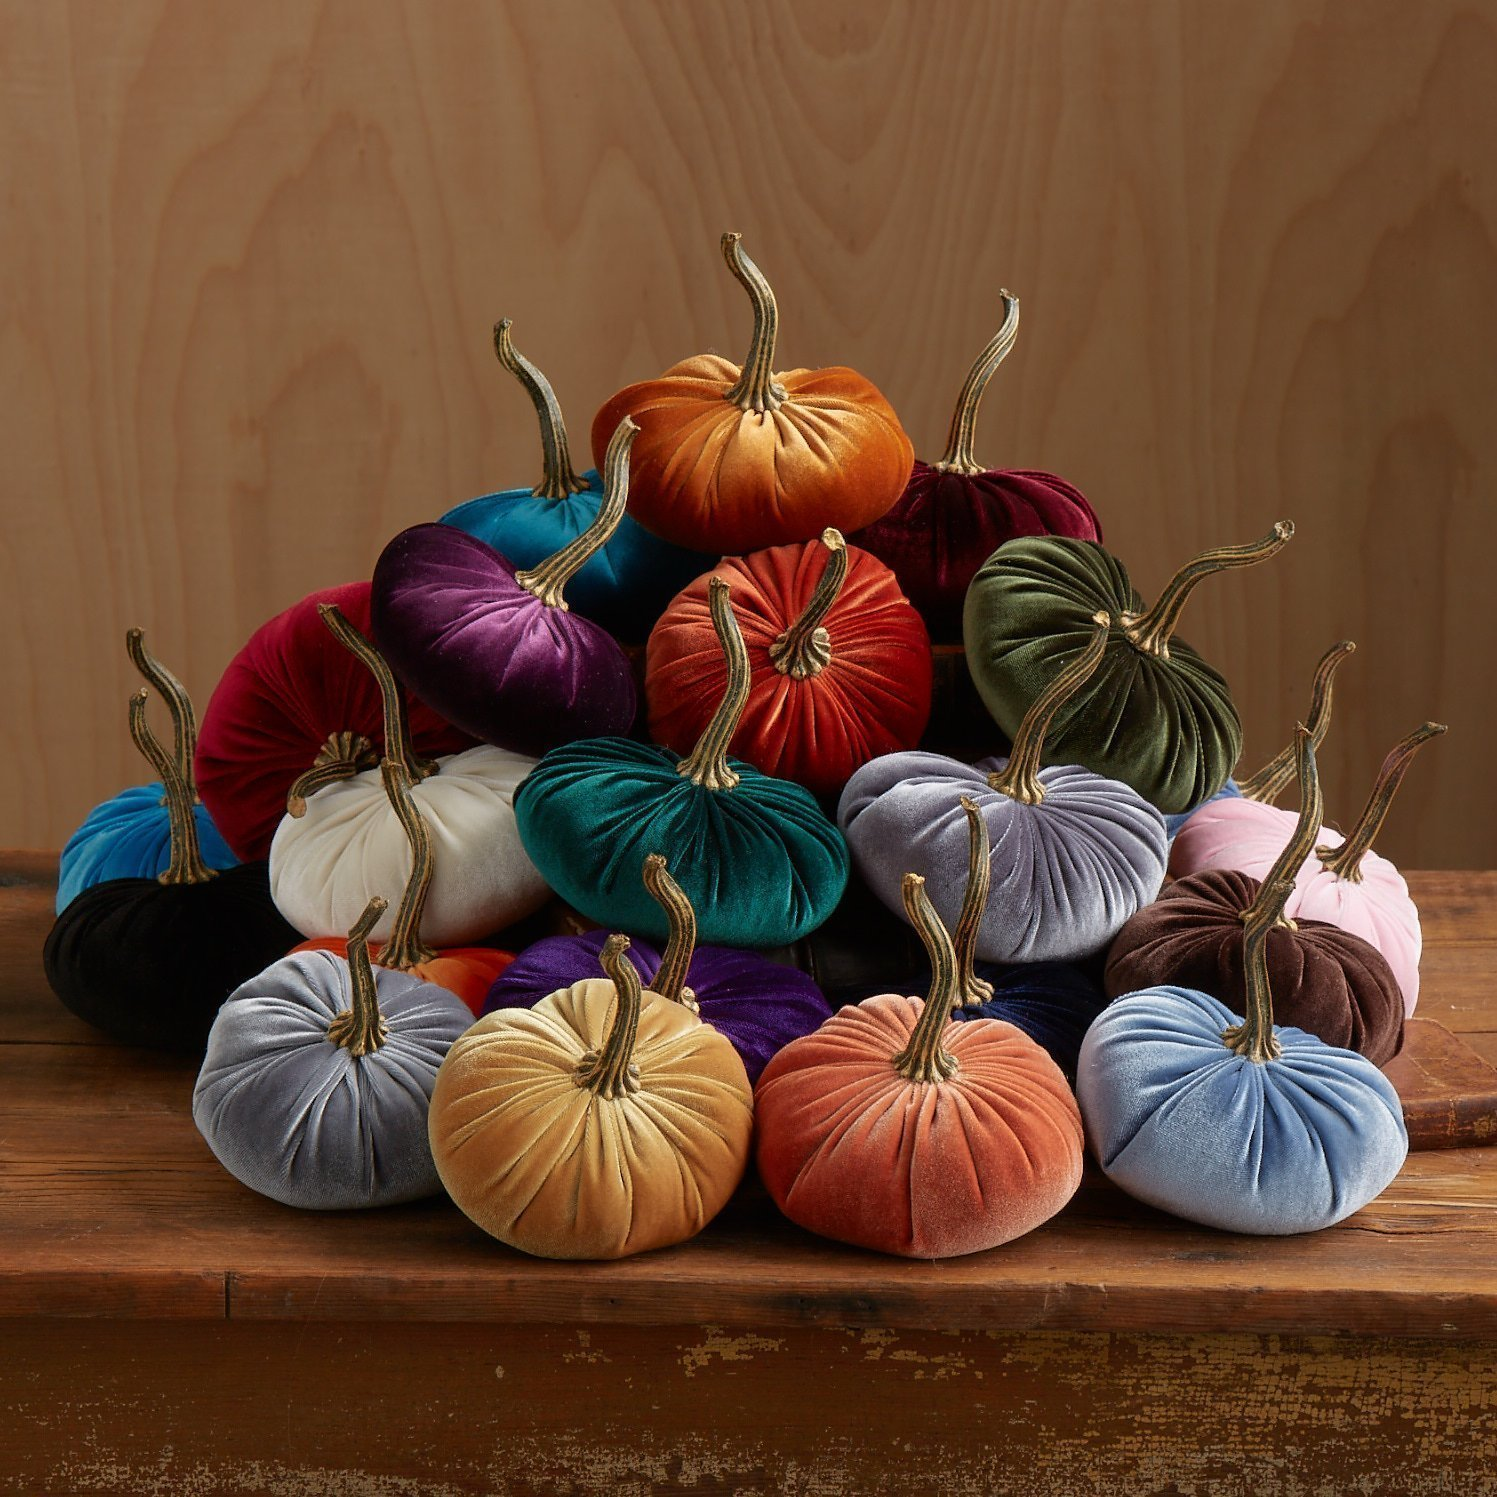 Velvet Pumpkins, SET of 4: Hot Pink, Magenta, Pink, White: Home Decor, Holiday Mantle Decor, Centerpiece, Fall, Halloween, Thanksgiving